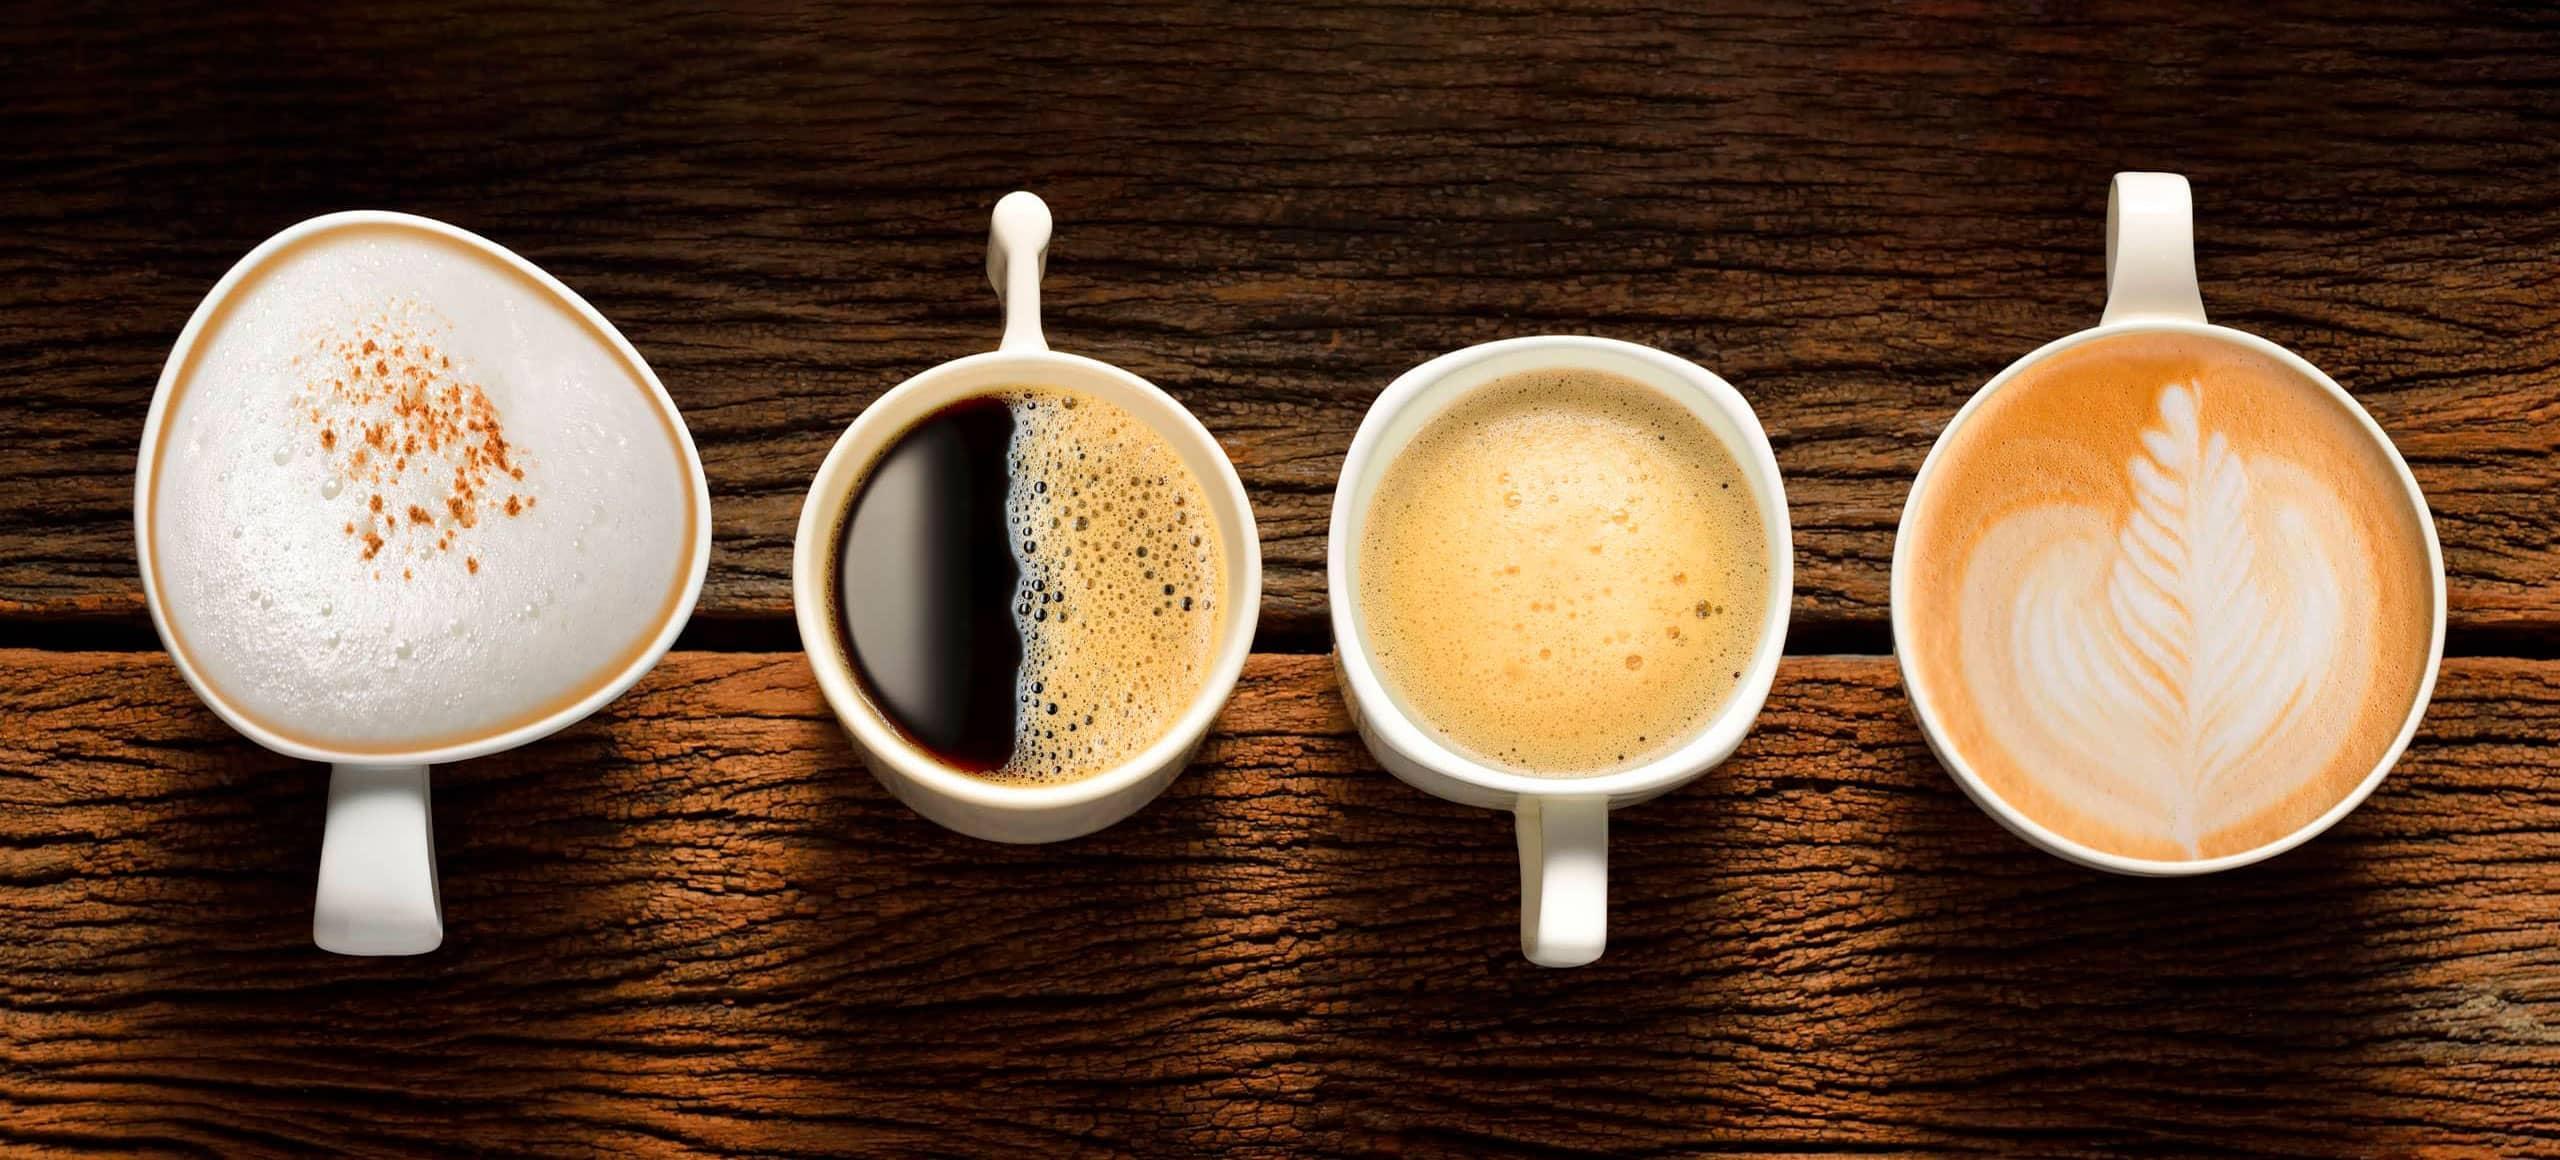 Kaffees mit Crema